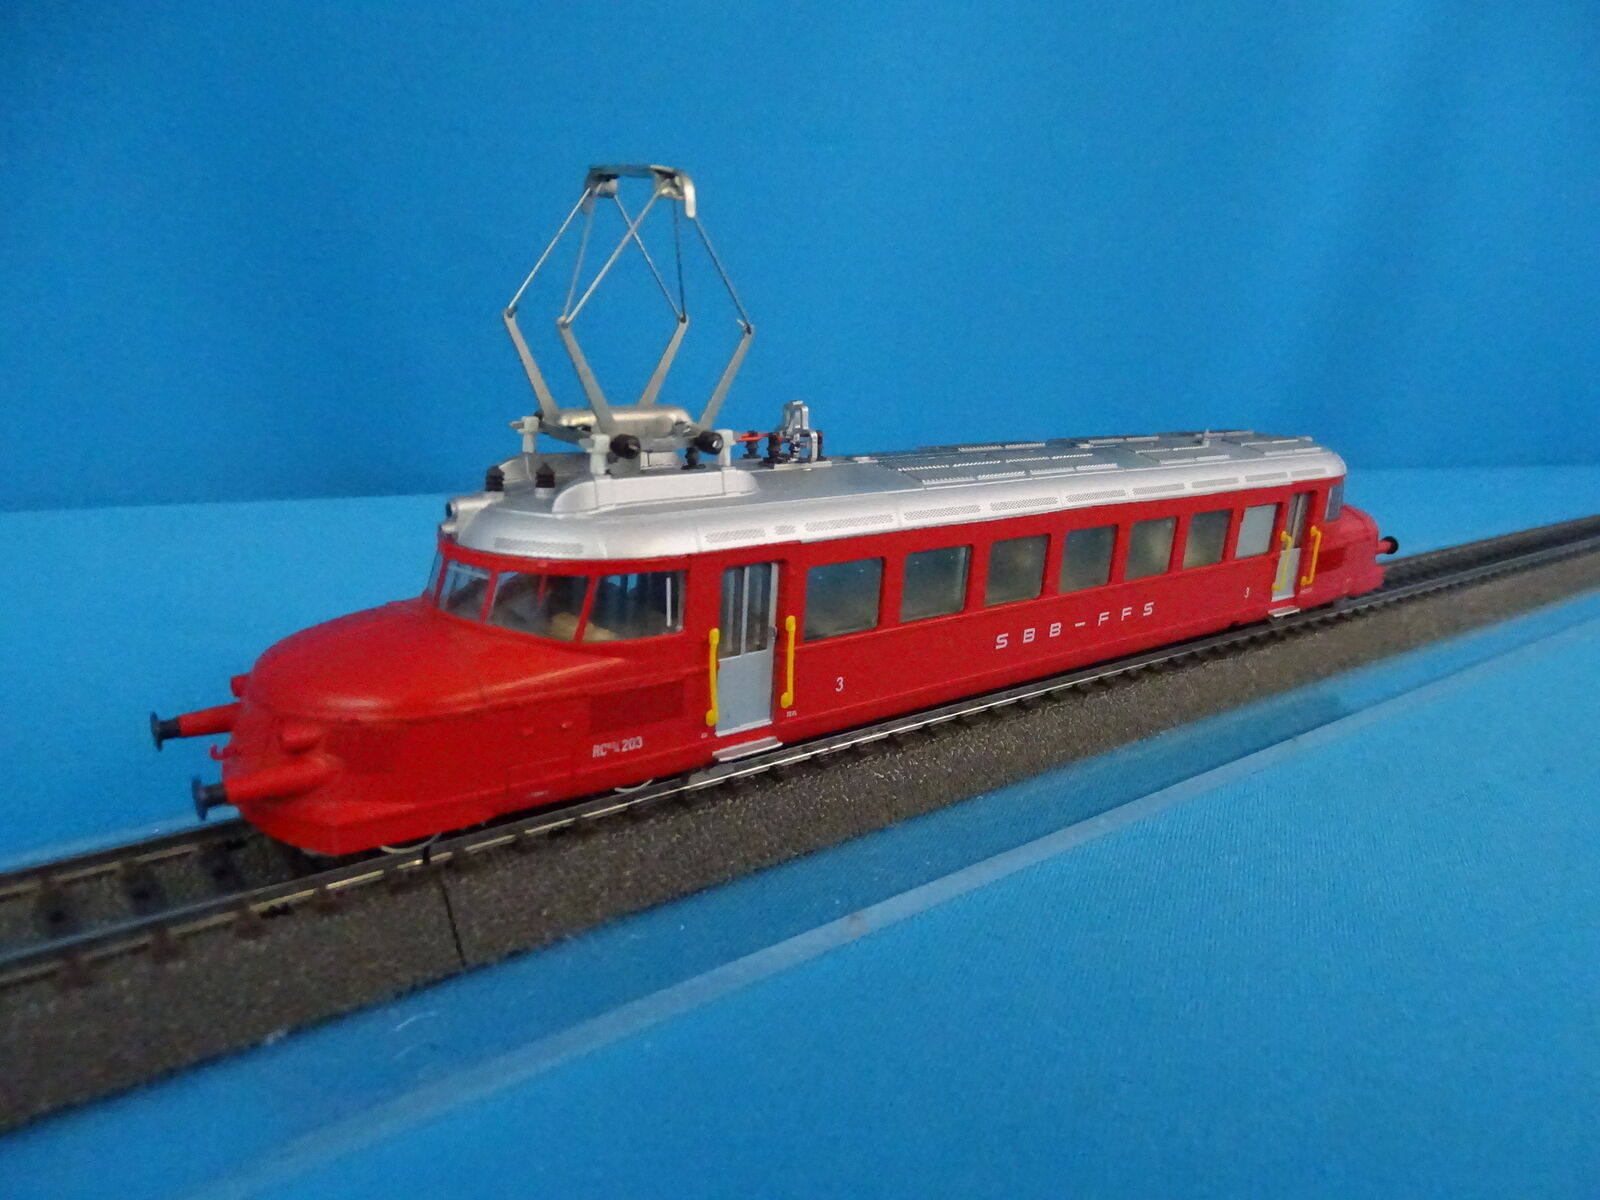 Marklin 3 SBB CFF Train Car ROTER PFEIL Rojo Arrow version 1 slow gear